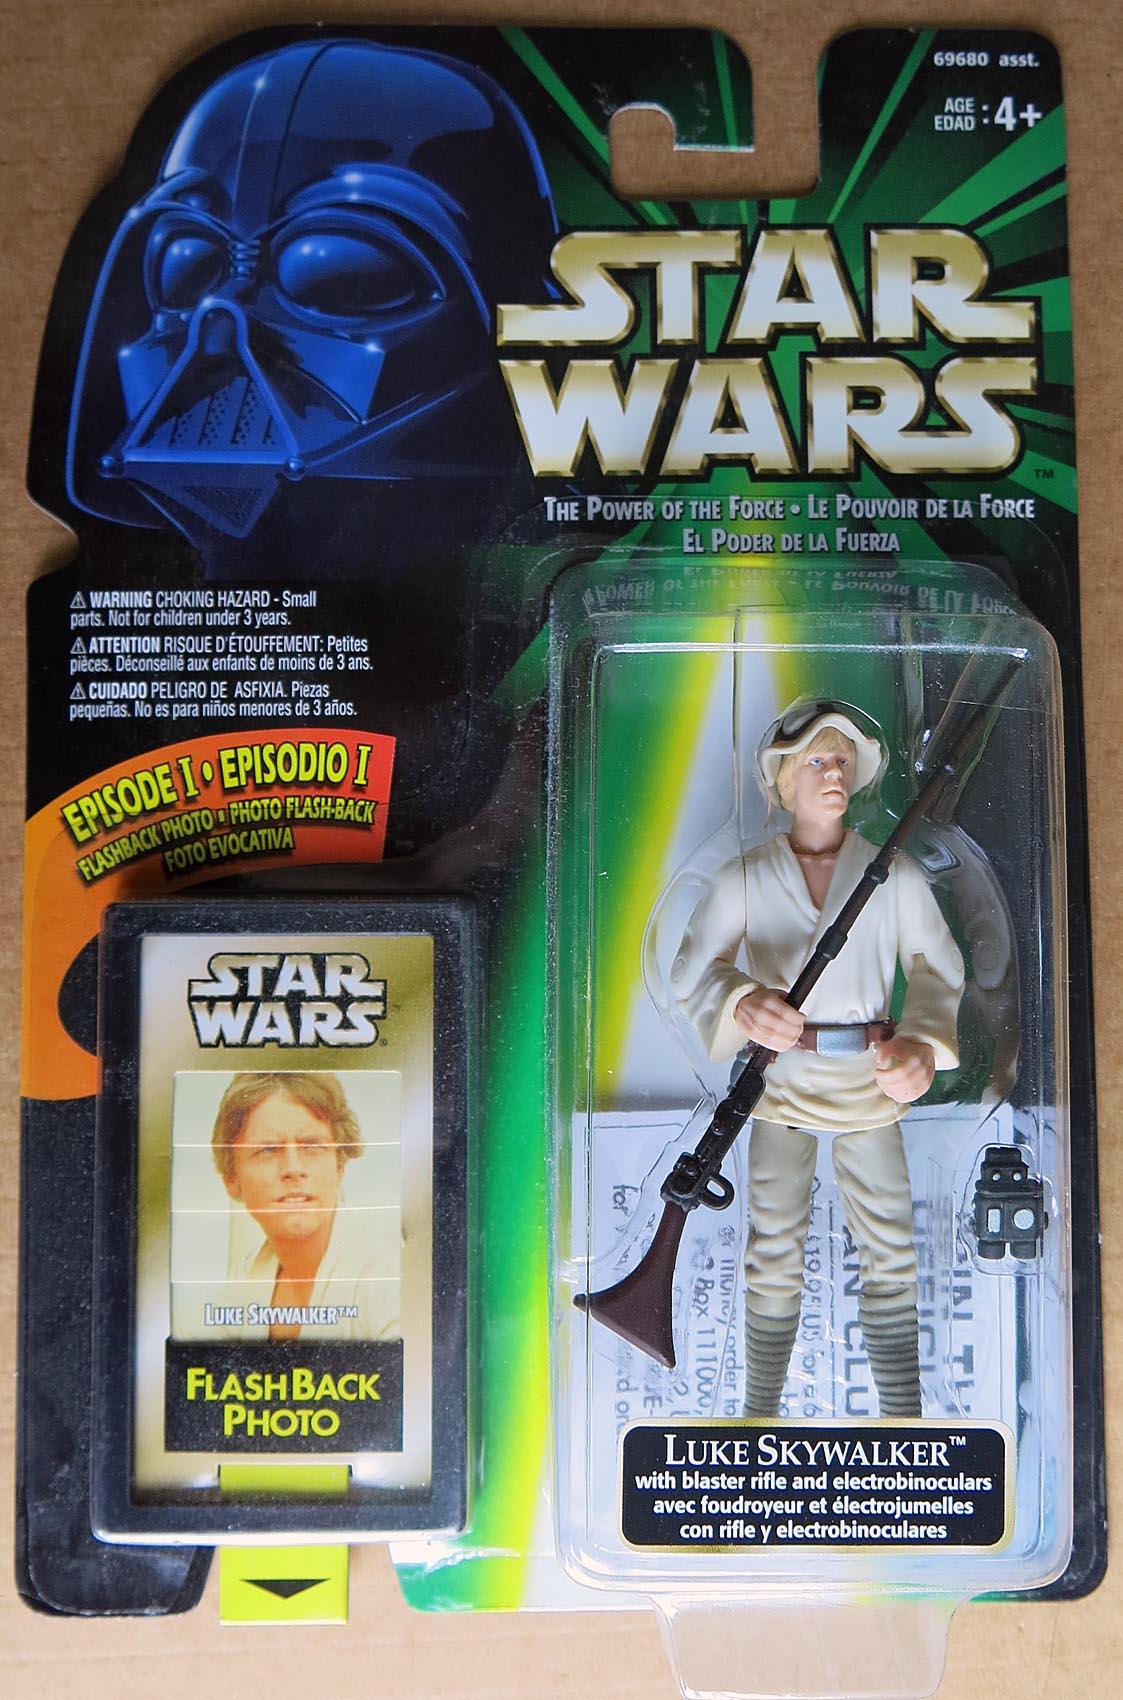 Darth Vader R2-D2 Action Masters Diecast Figures Rare Star Wars Luke Skywalker